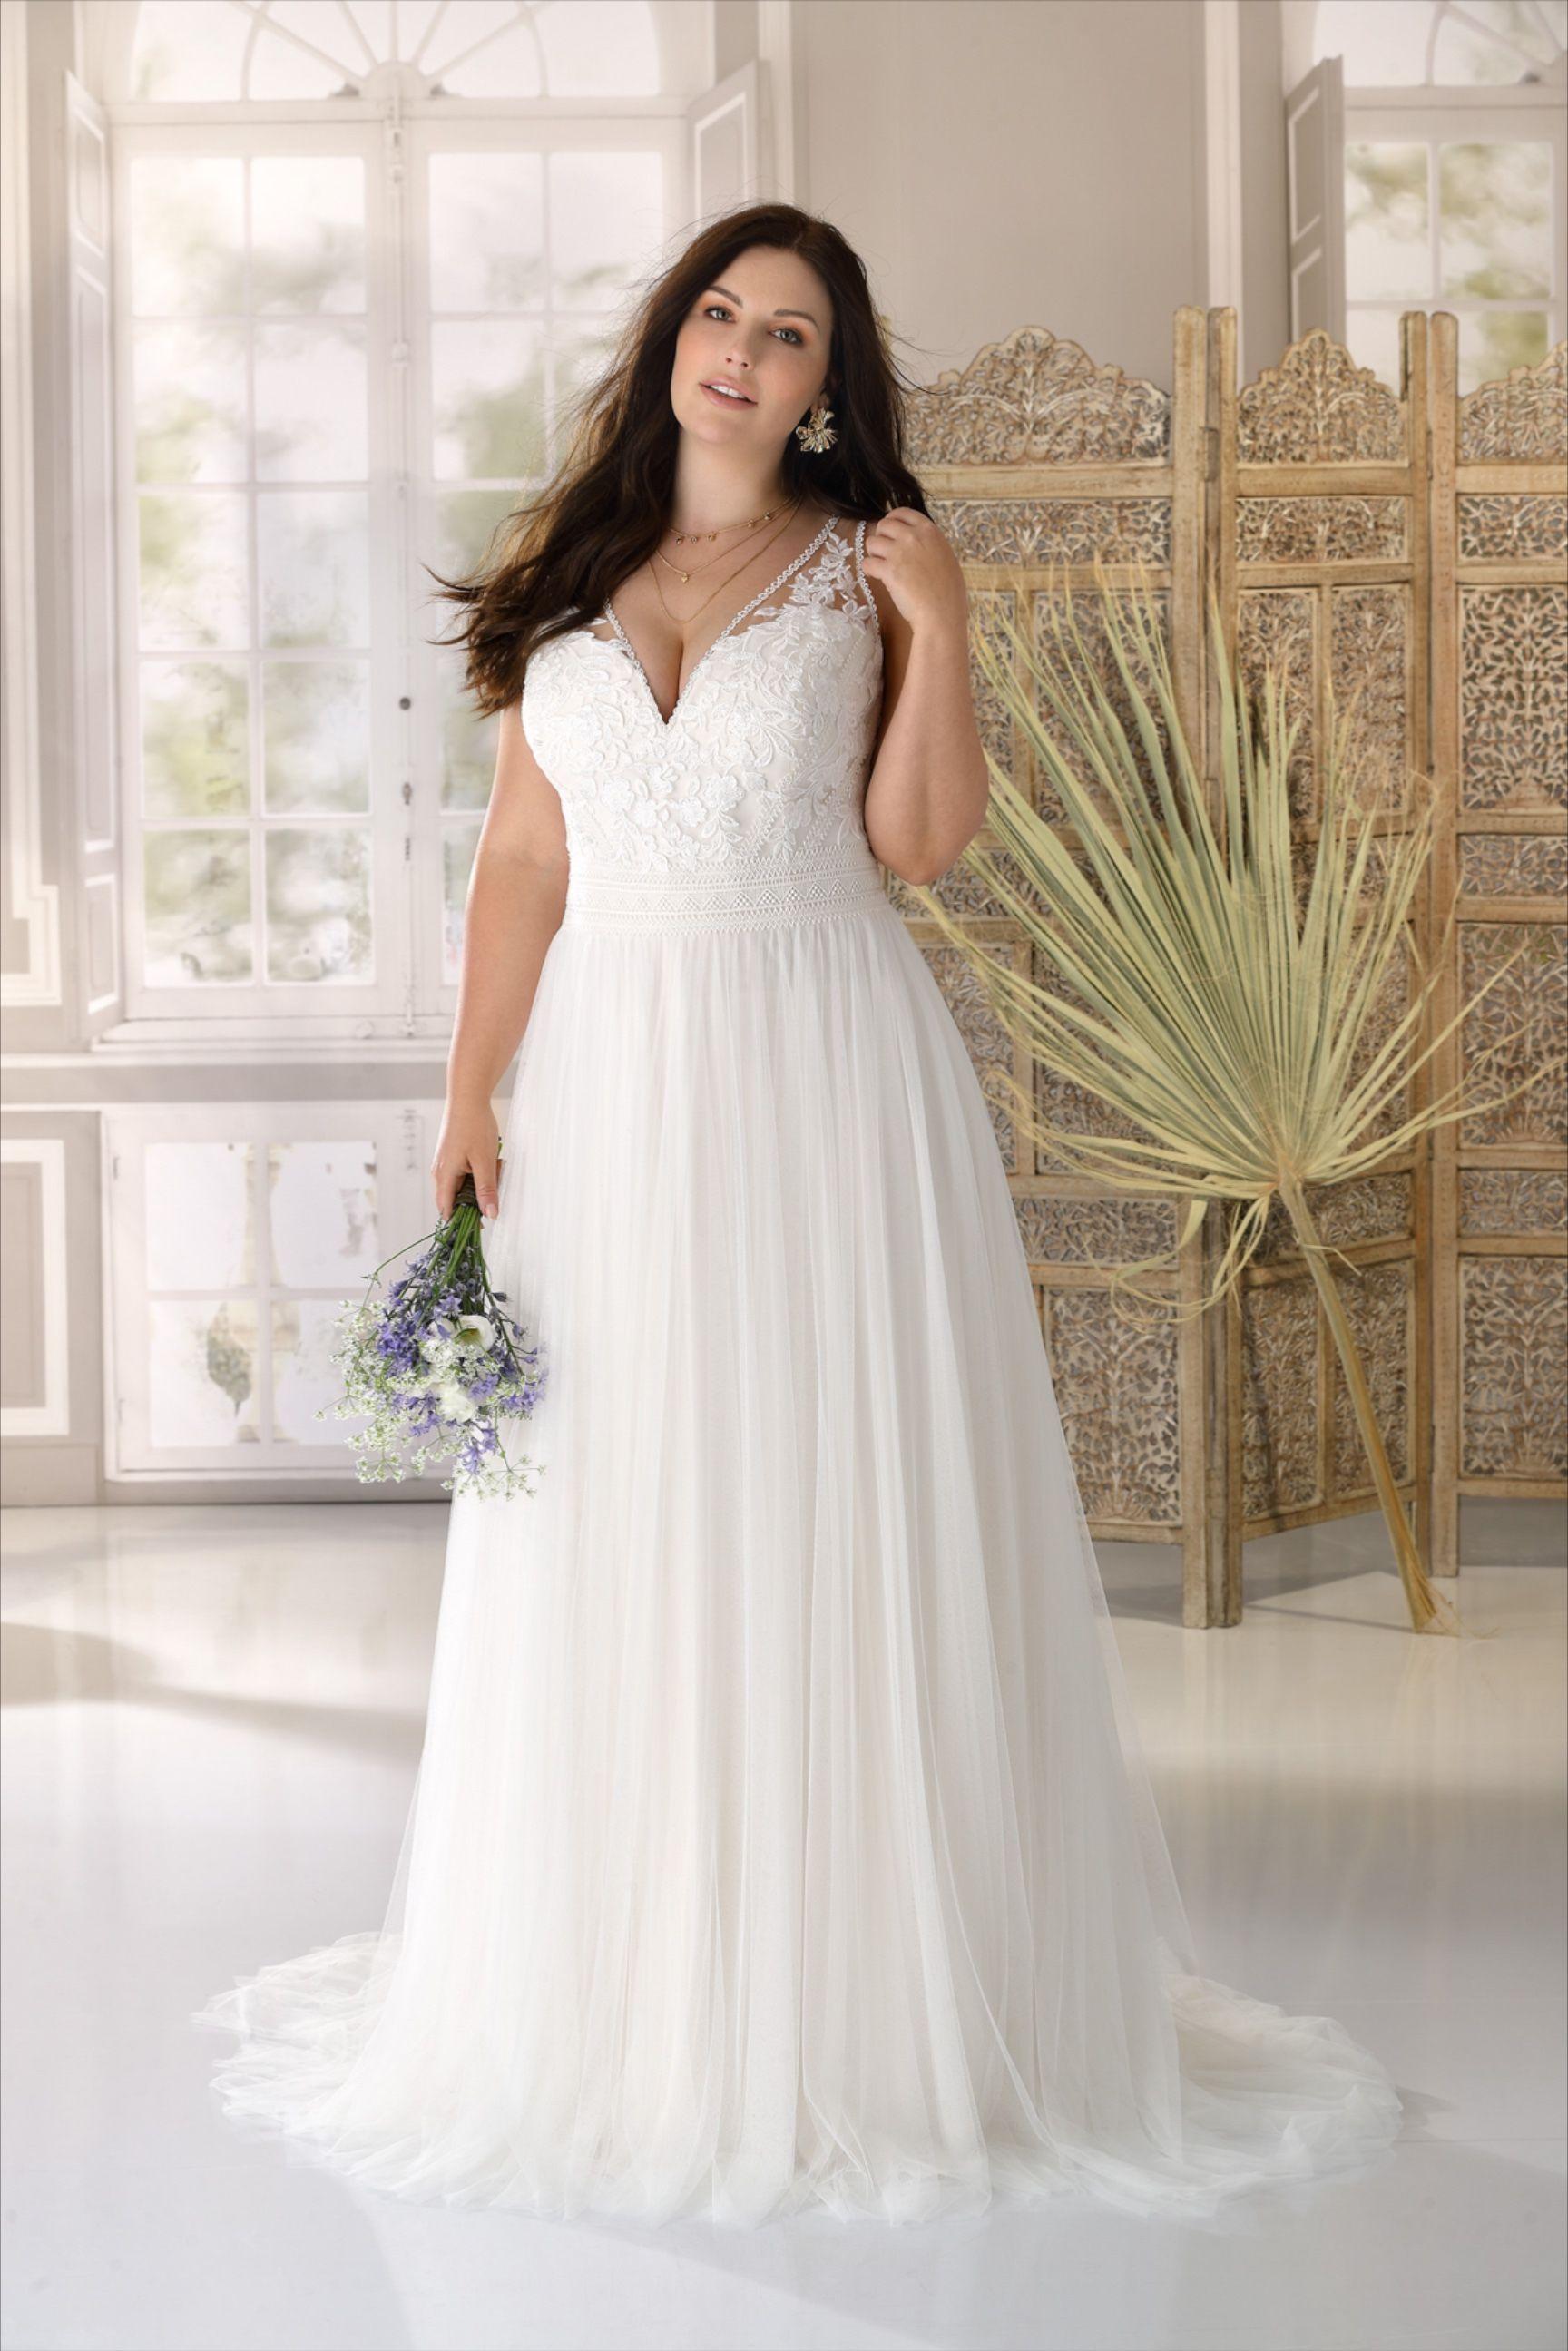 Ladybird Wedding Dress Style Ls321062 Curvy Wedding Dress Plus Wedding Dresses Wedding Dress Styles [ 2591 x 1728 Pixel ]